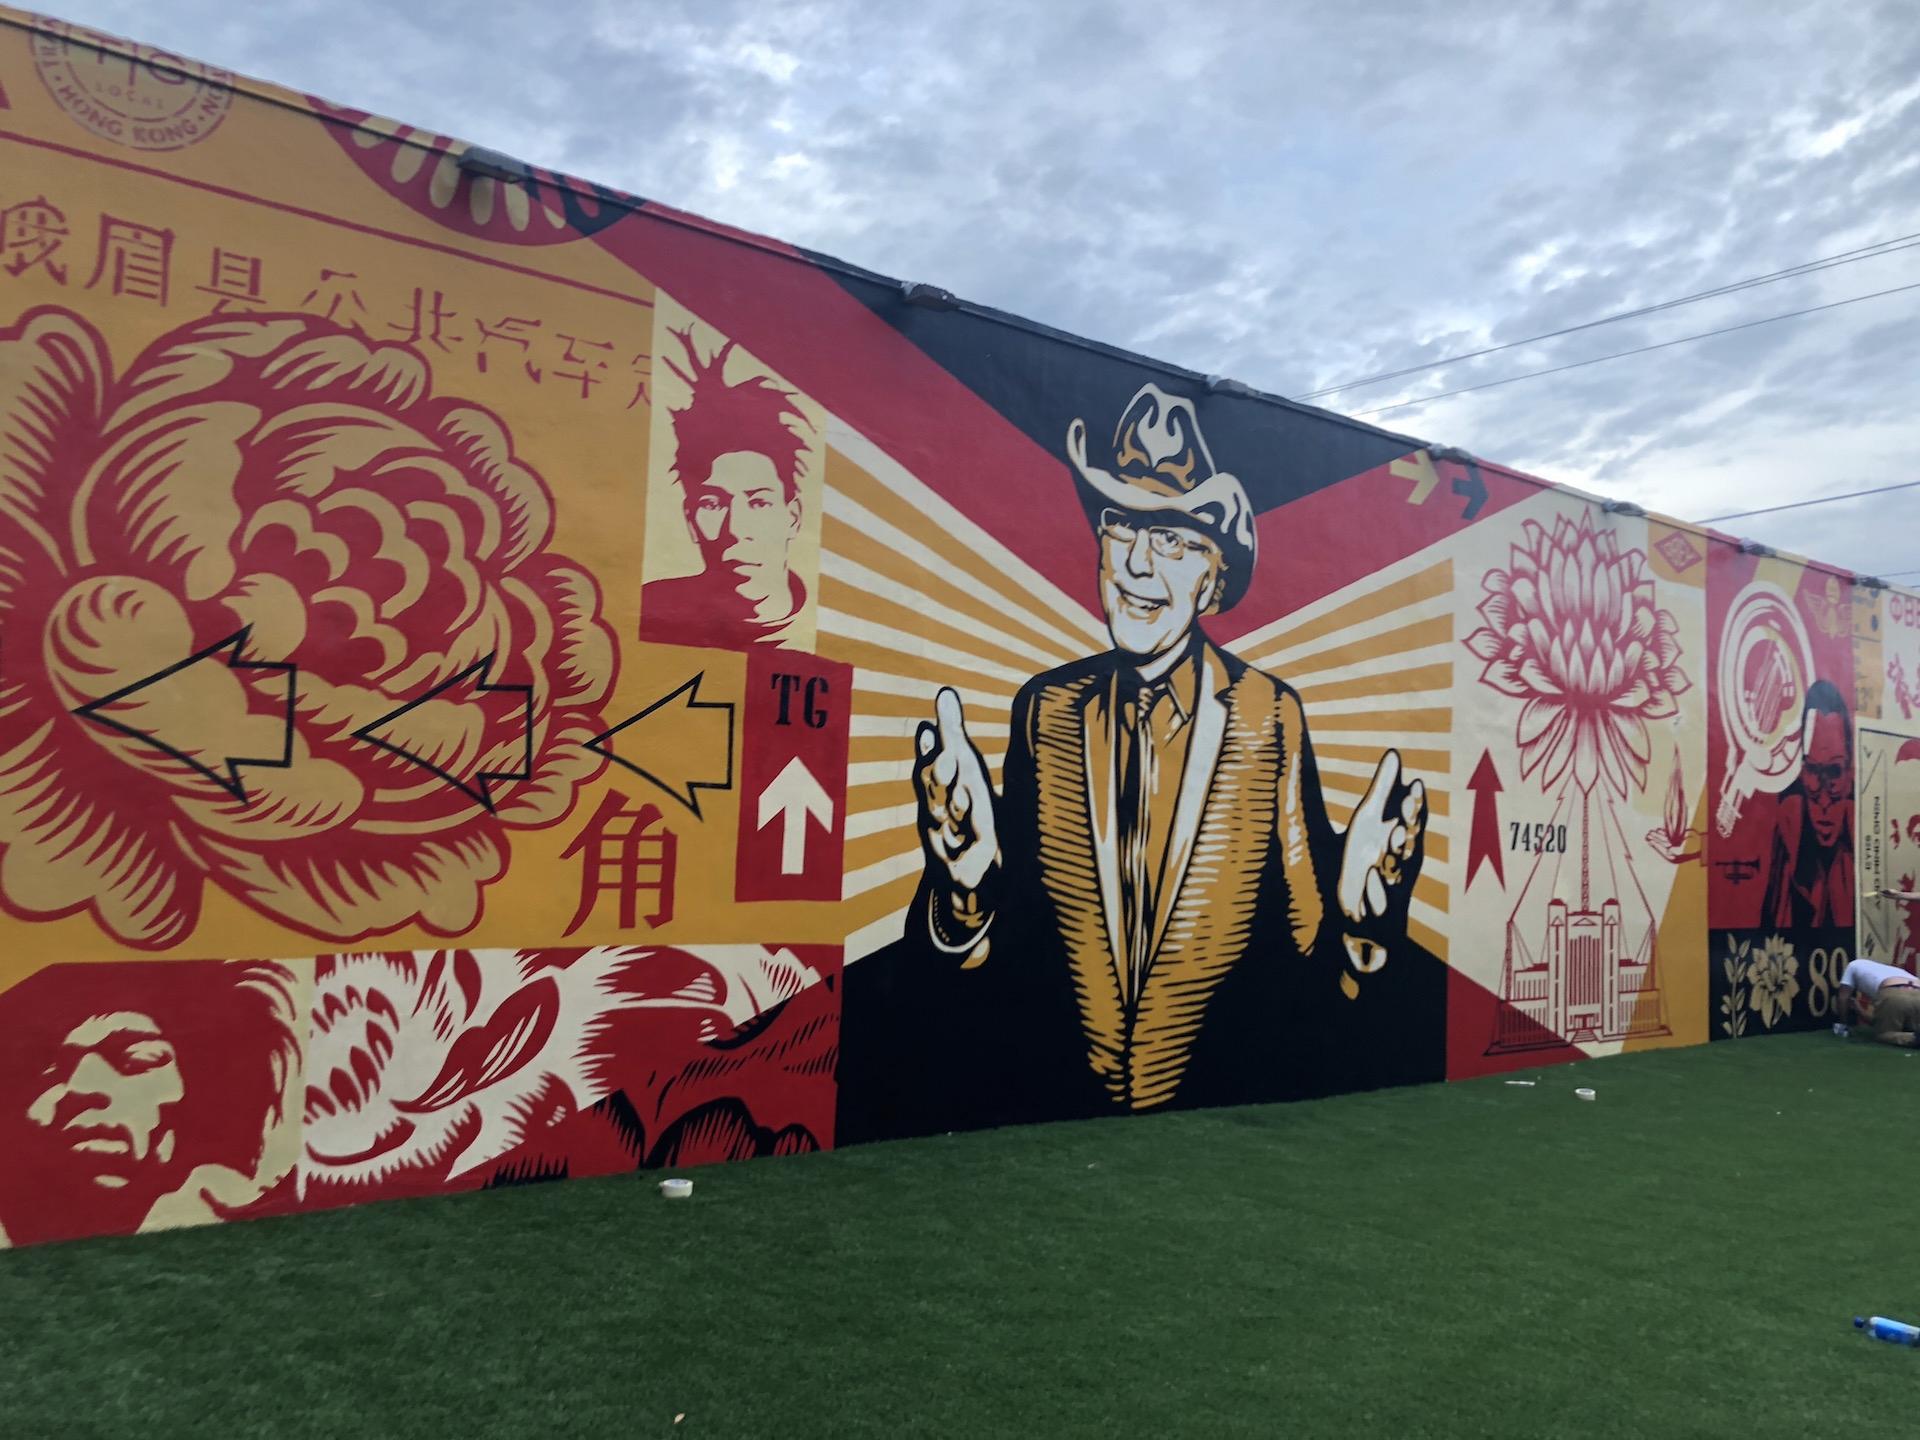 Shepard Faiery Wynwood Walls.jpg